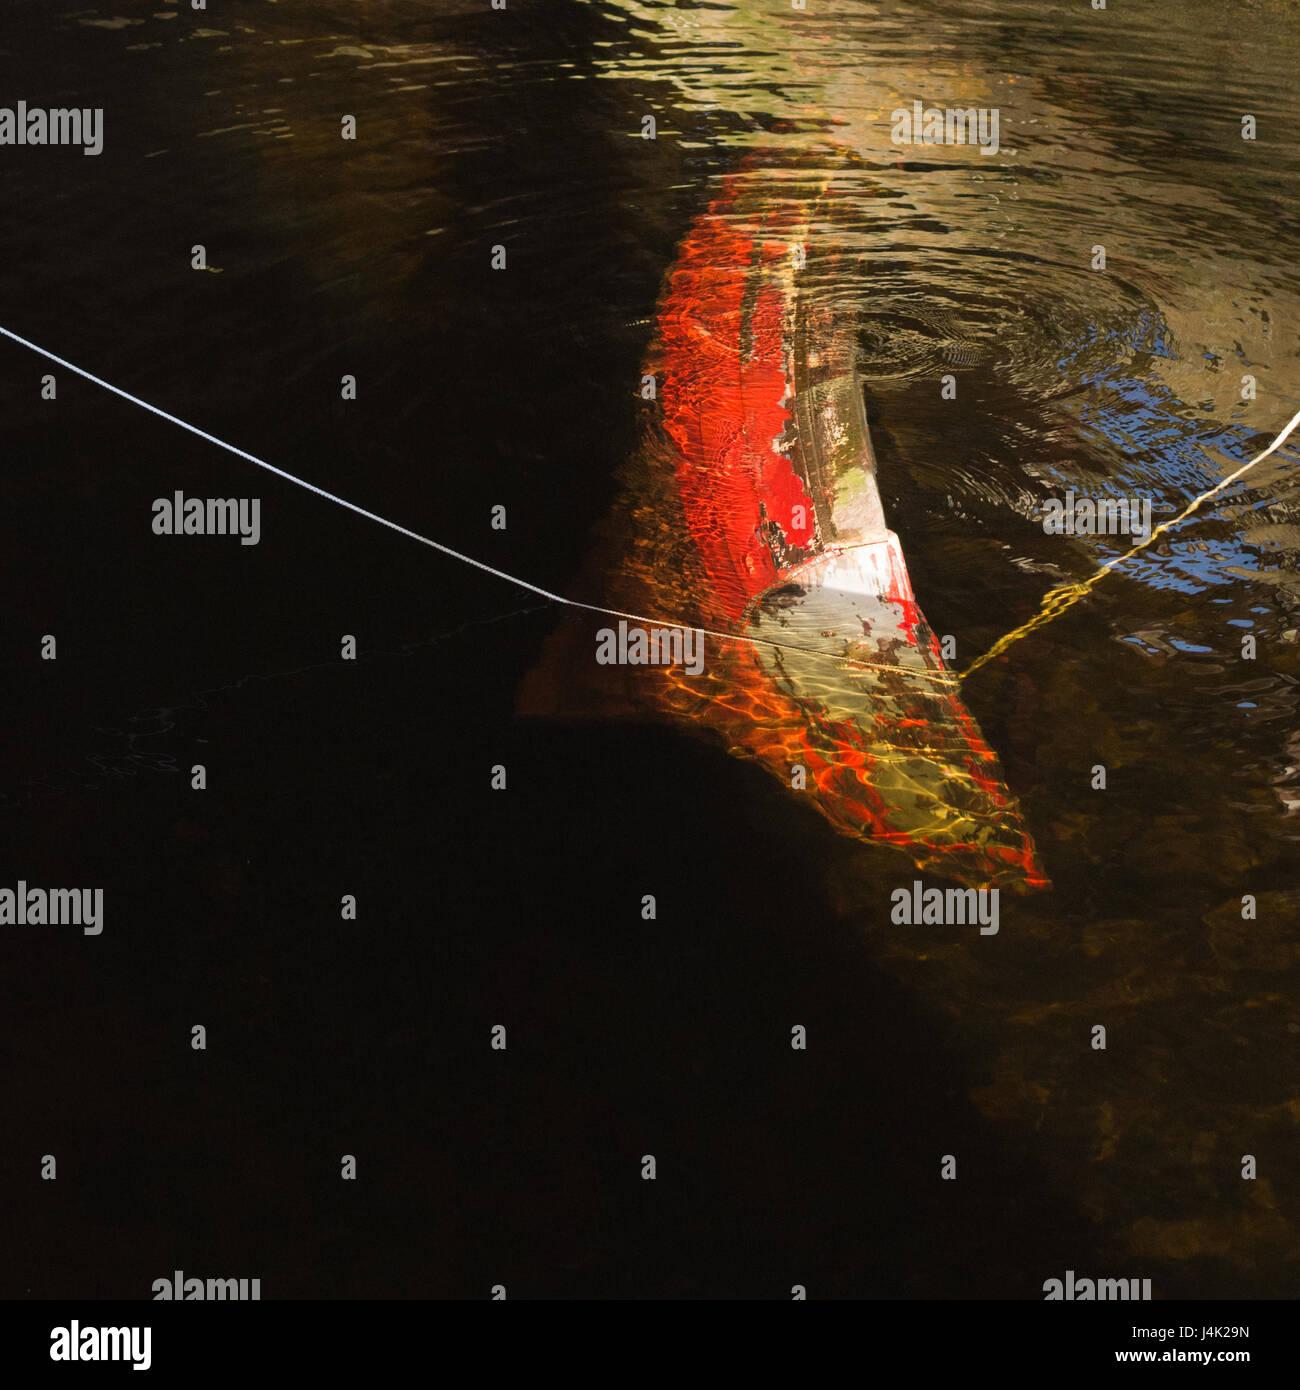 Naufrage du bateau - vieille petite barque rouge naufrage Photo Stock